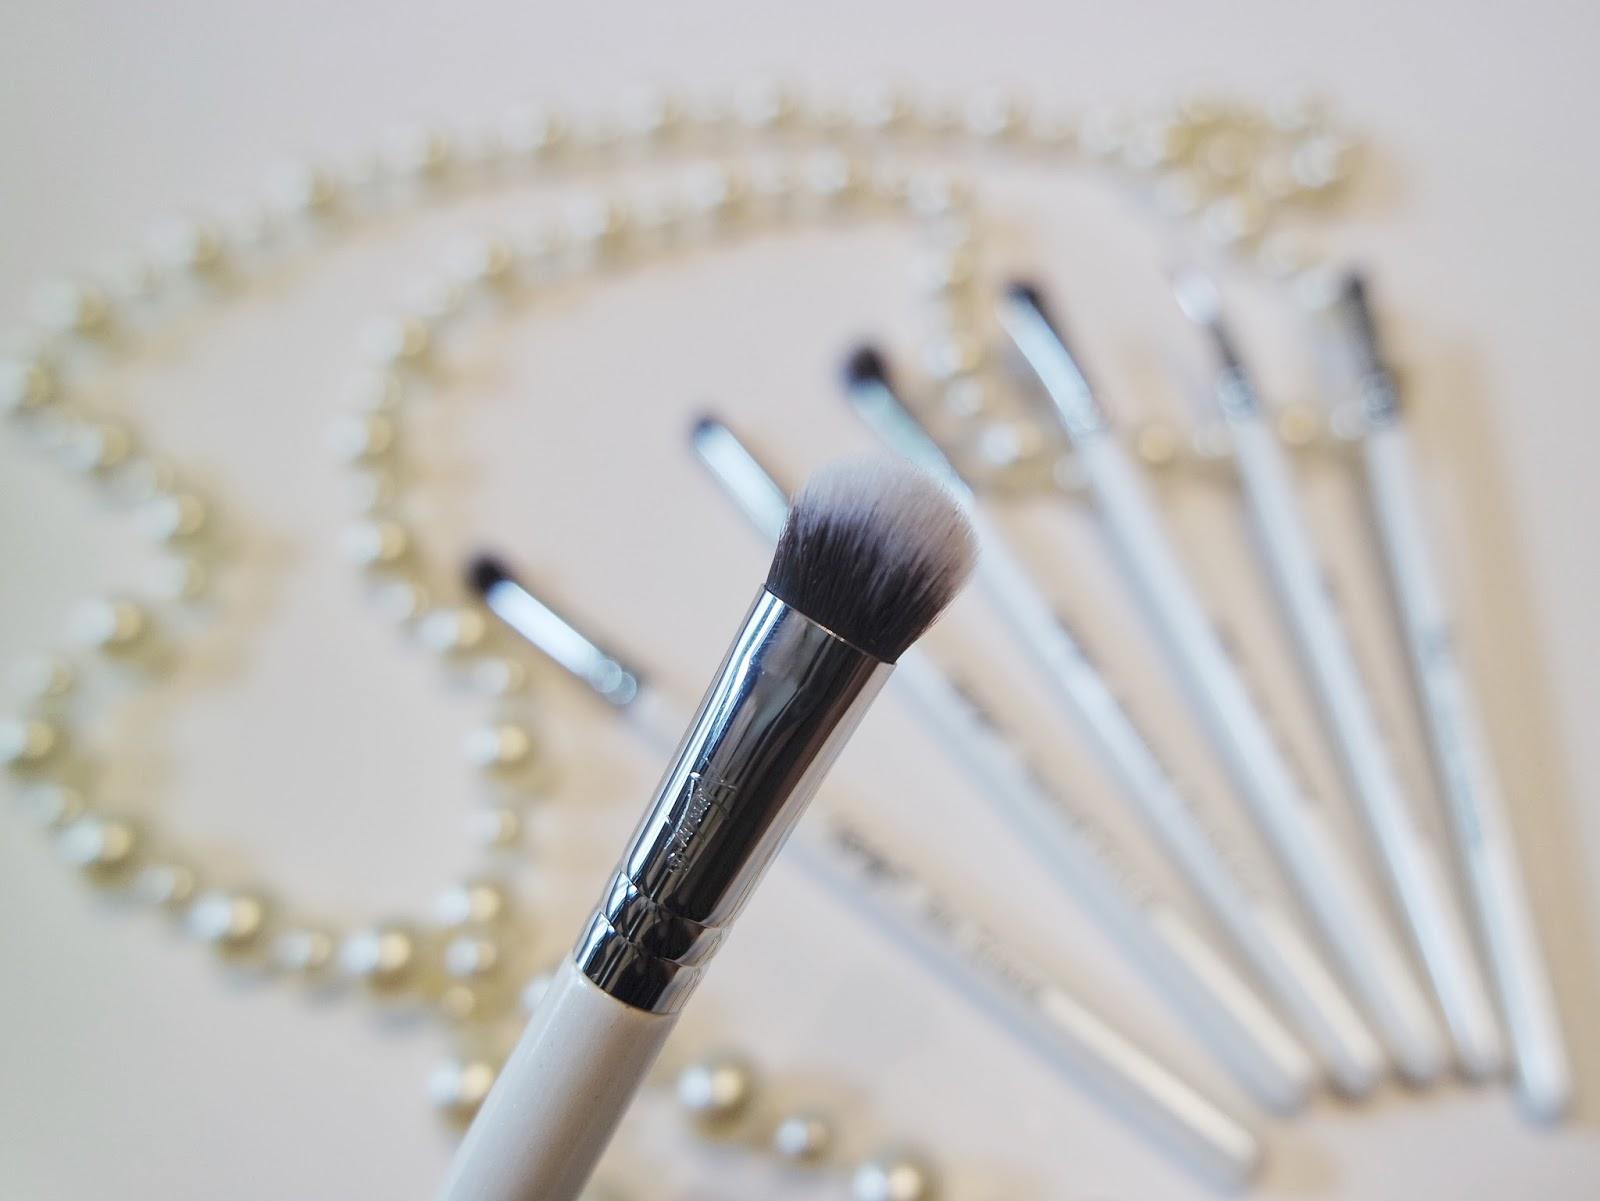 Nanshy Vegan Cruelty Free Makeup Brushes for Eyes